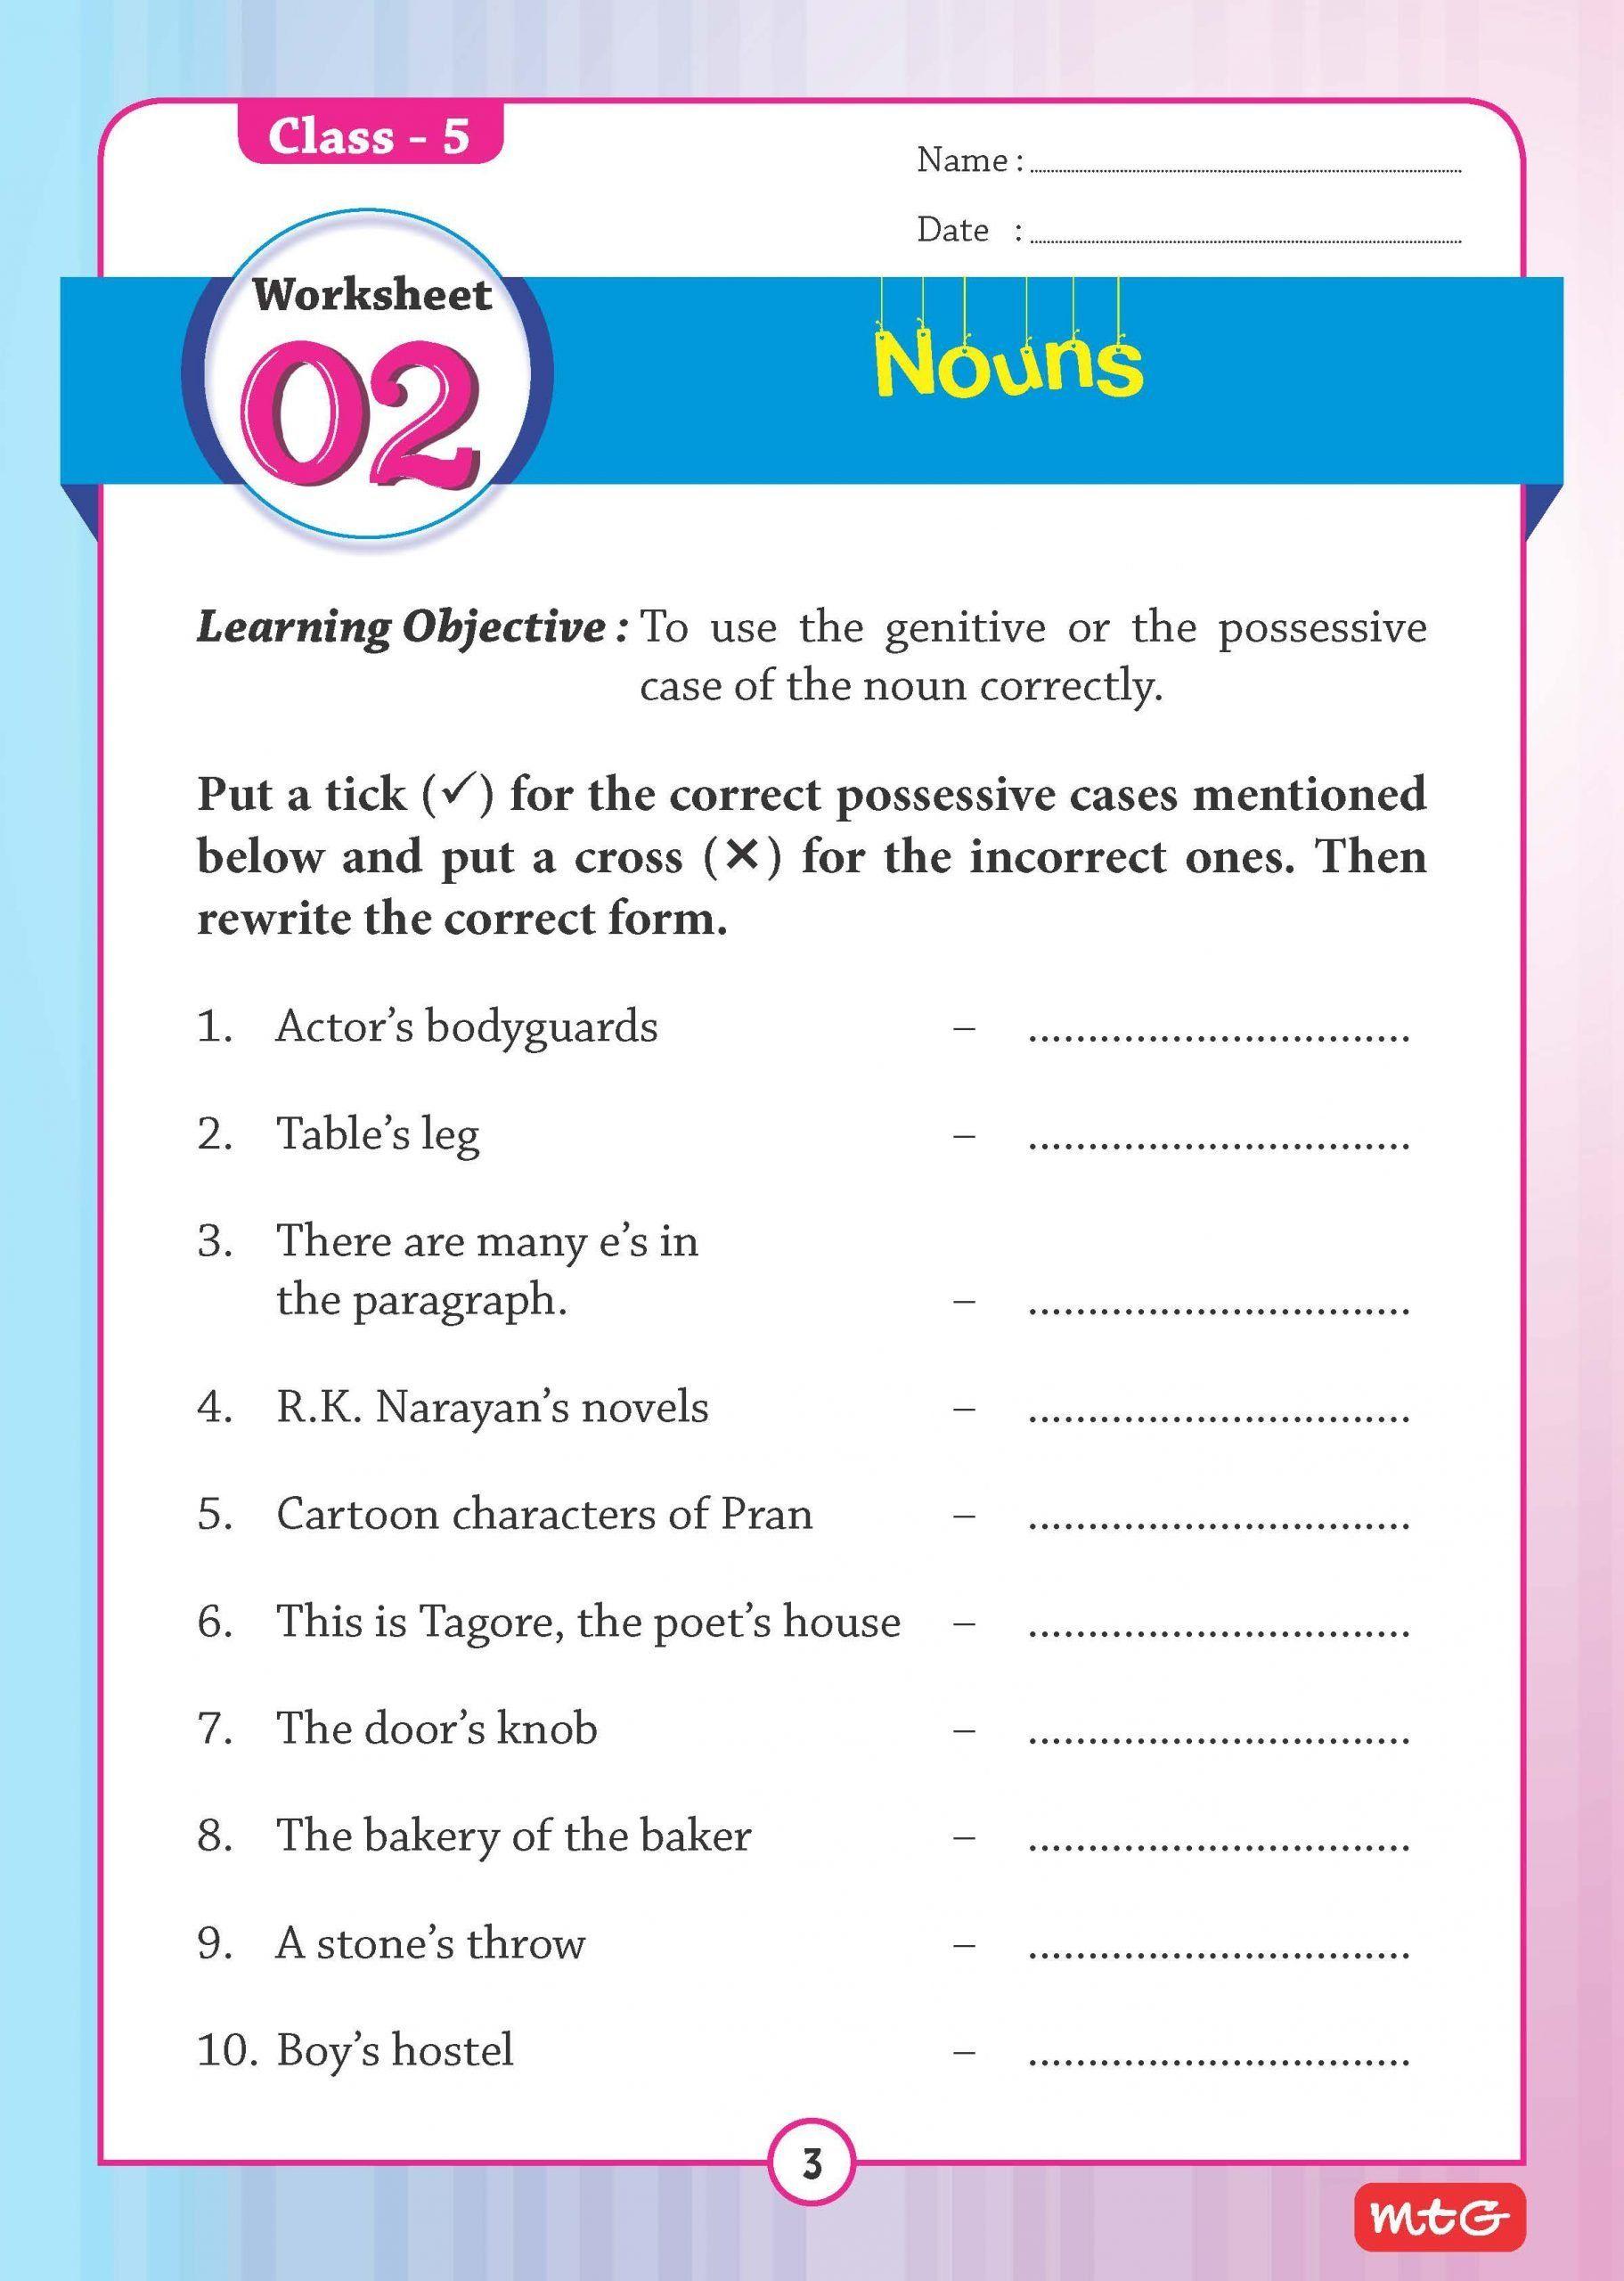 Grammar Worksheet 5th Grade 51 English Grammar Worksheets Class 5 Instant Able Grammar Worksheets English Grammar Worksheets Word Puzzles For Kids